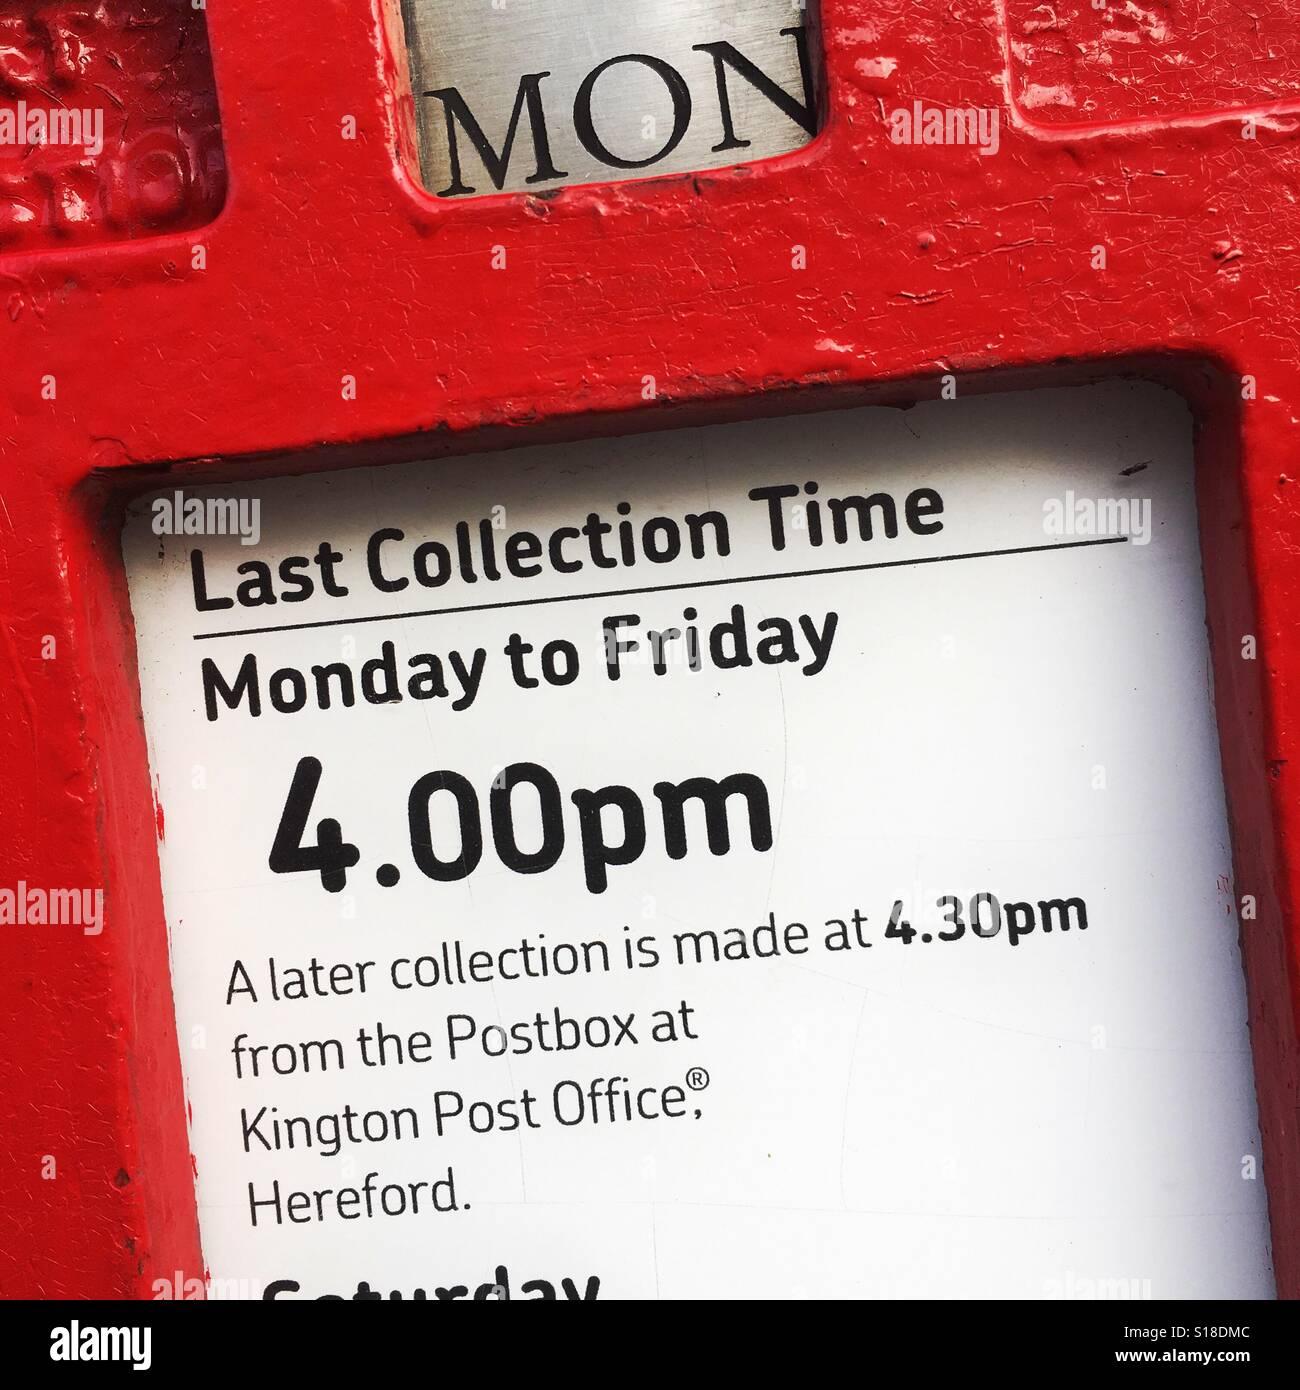 Royal Mail post box collection times U.K. - Stock Image